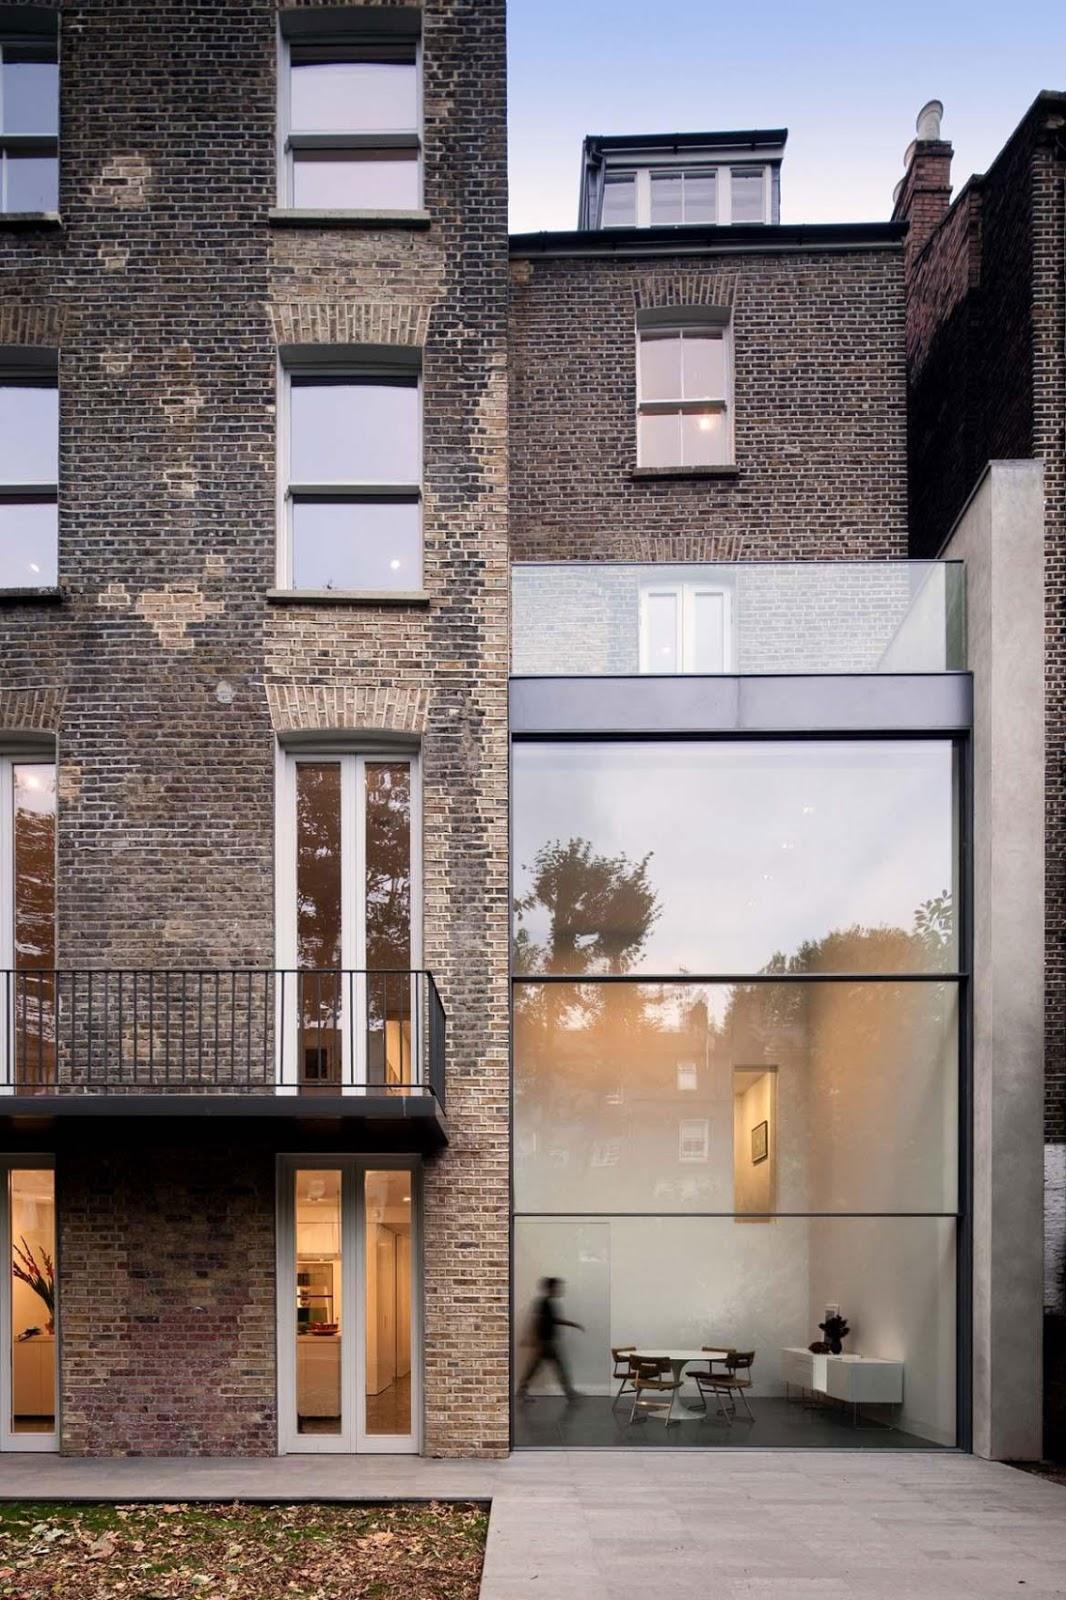 simplicity love bassett road house london paul o architects. Black Bedroom Furniture Sets. Home Design Ideas